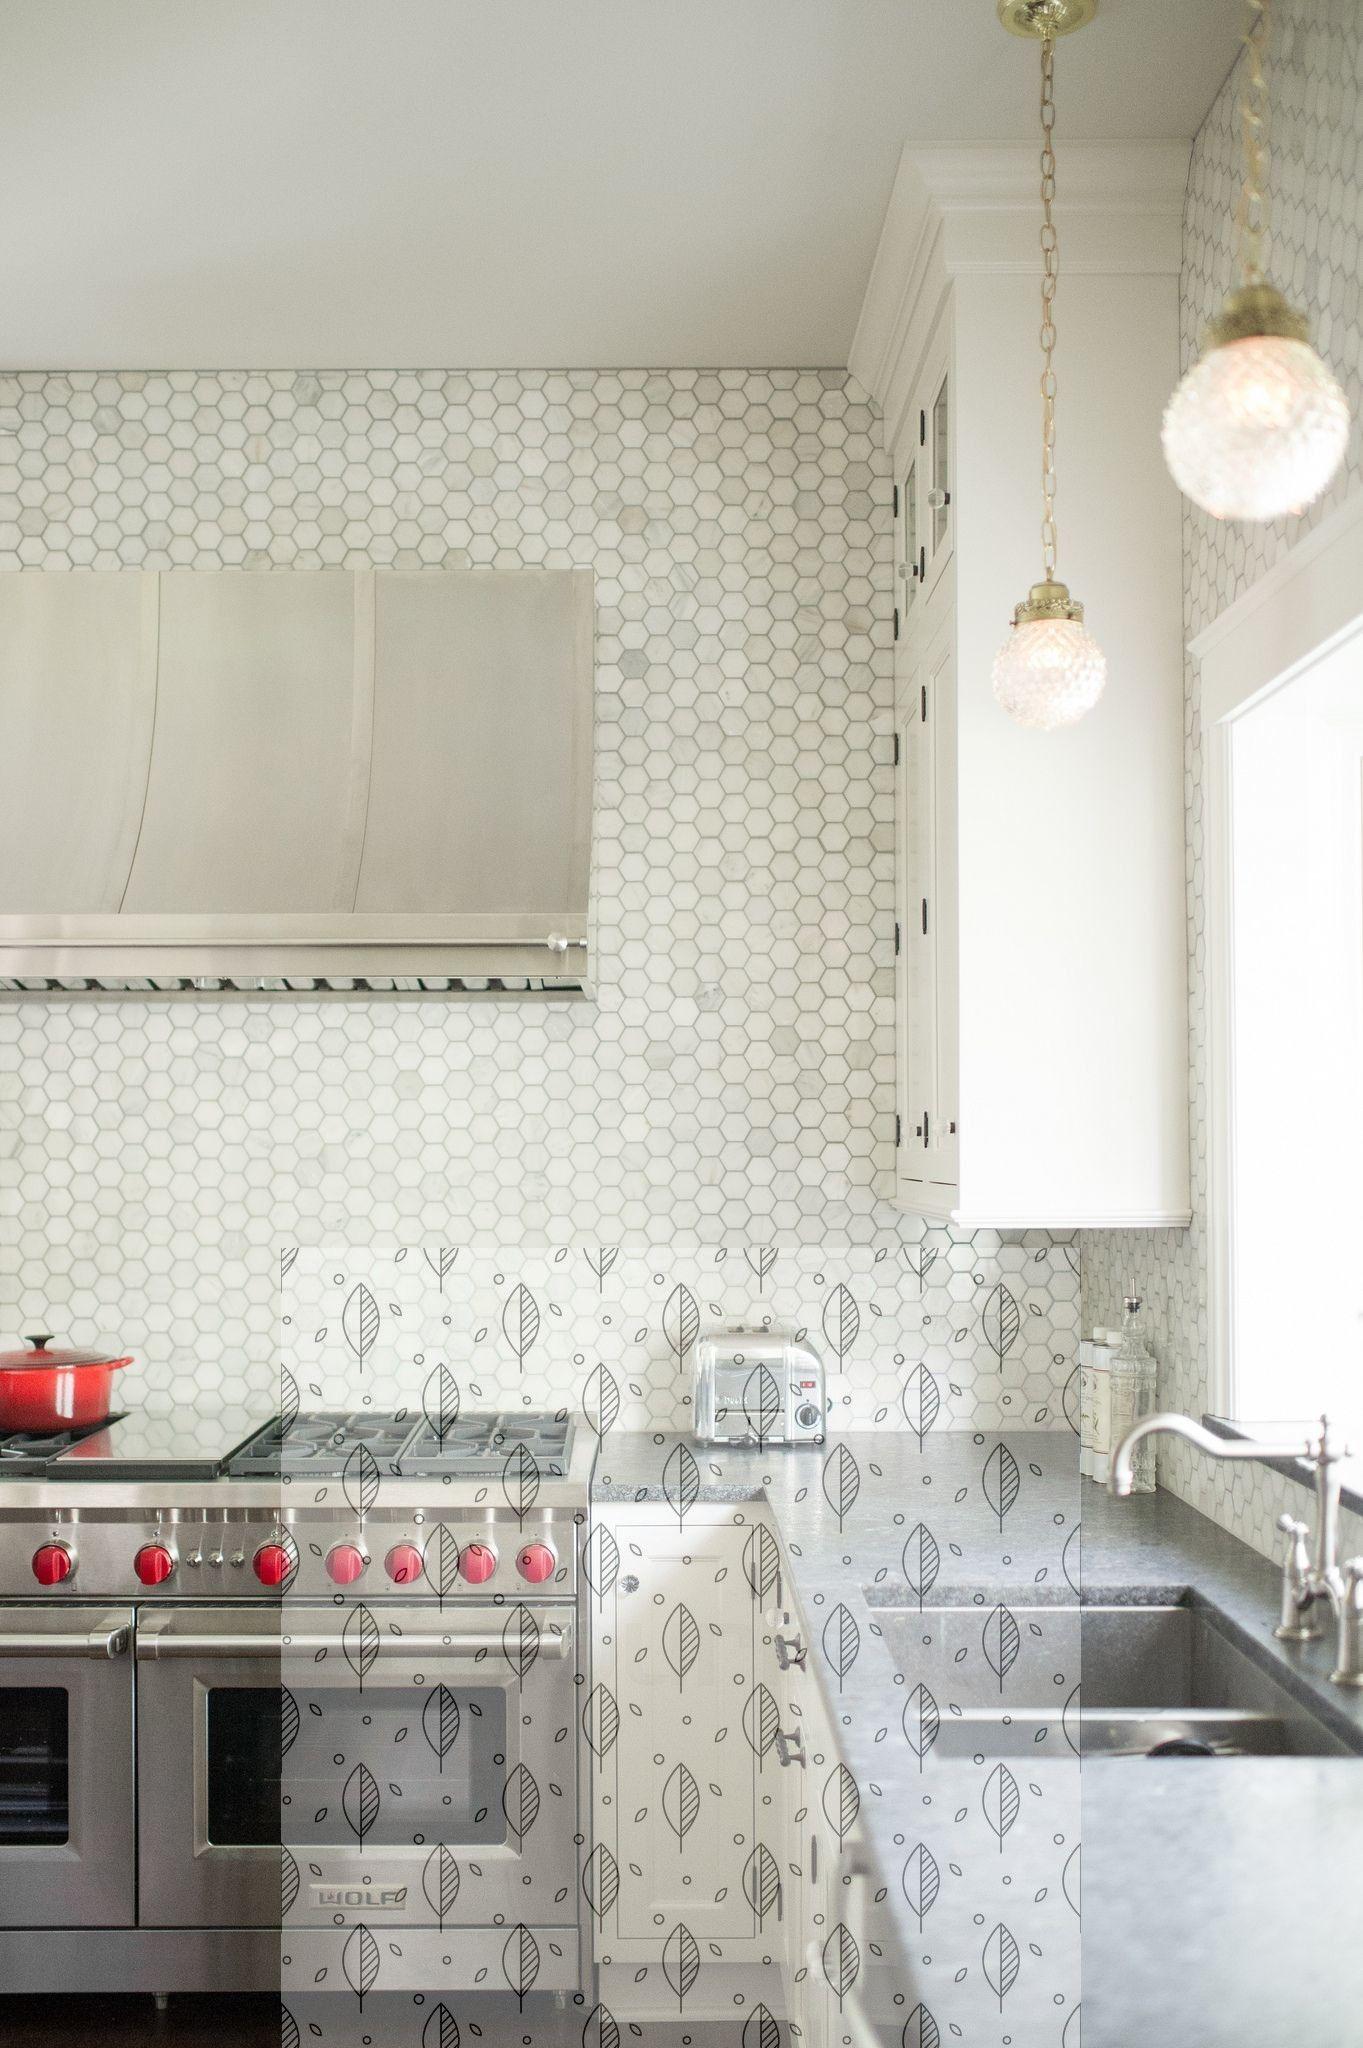 7 Top Cool Ideas Tile Backsplash Ideas backsplash designs